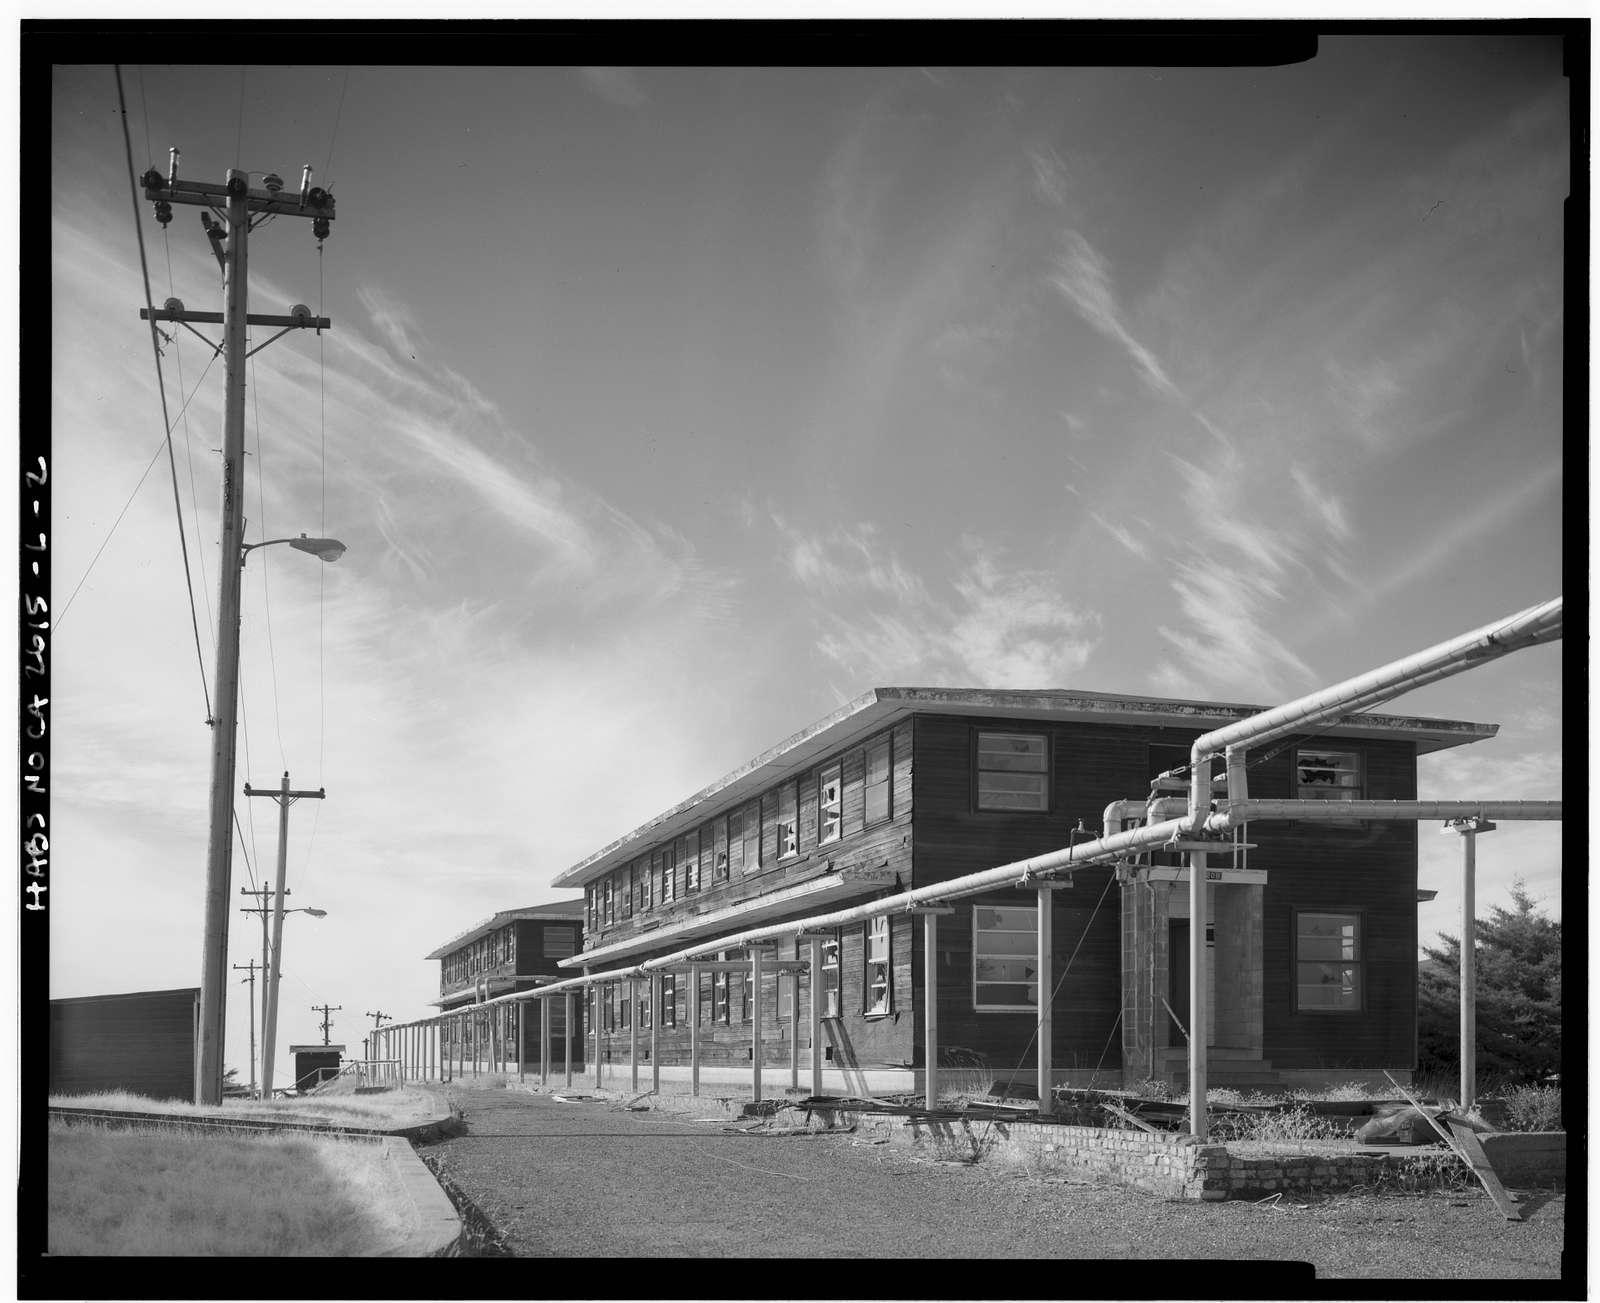 Mill Valley Air Force Station, Bachelor Airmen Quarters, East Ridgecrest Boulevard, Mount Tamalpais, Mill Valley, Marin County, CA